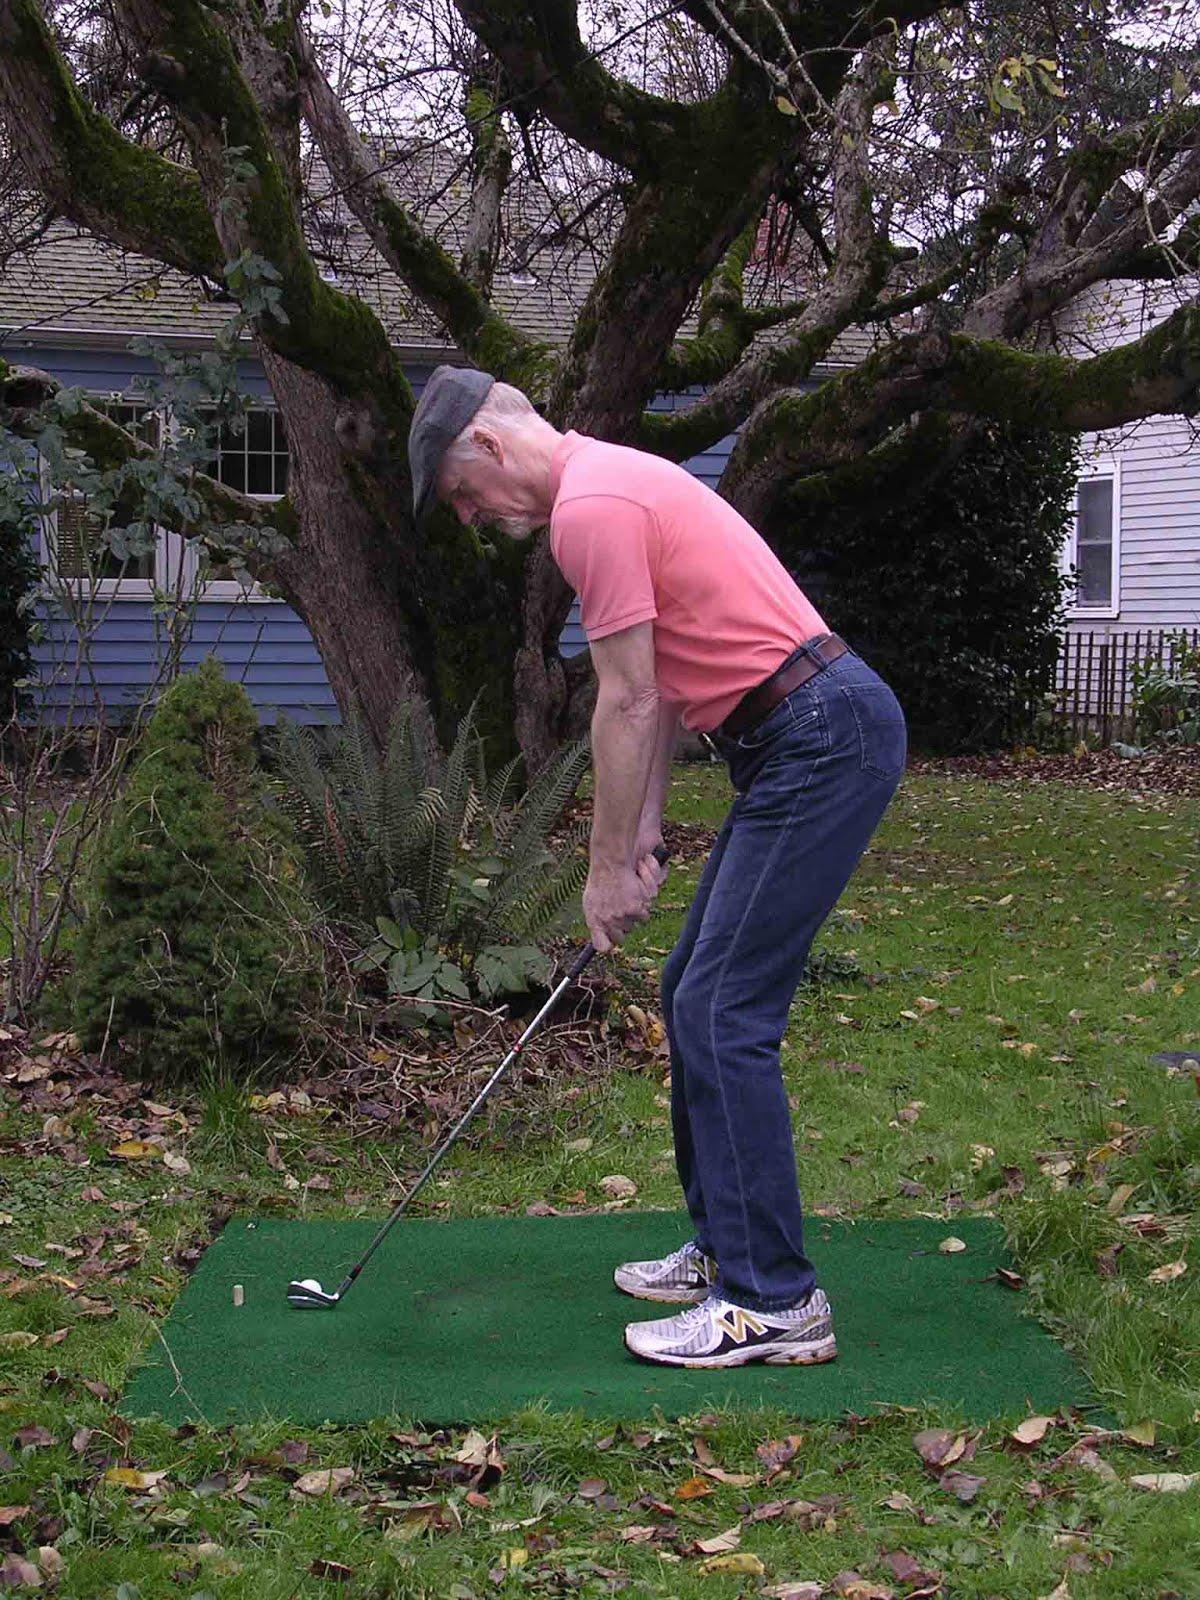 Golf Swing For Tall Golfers